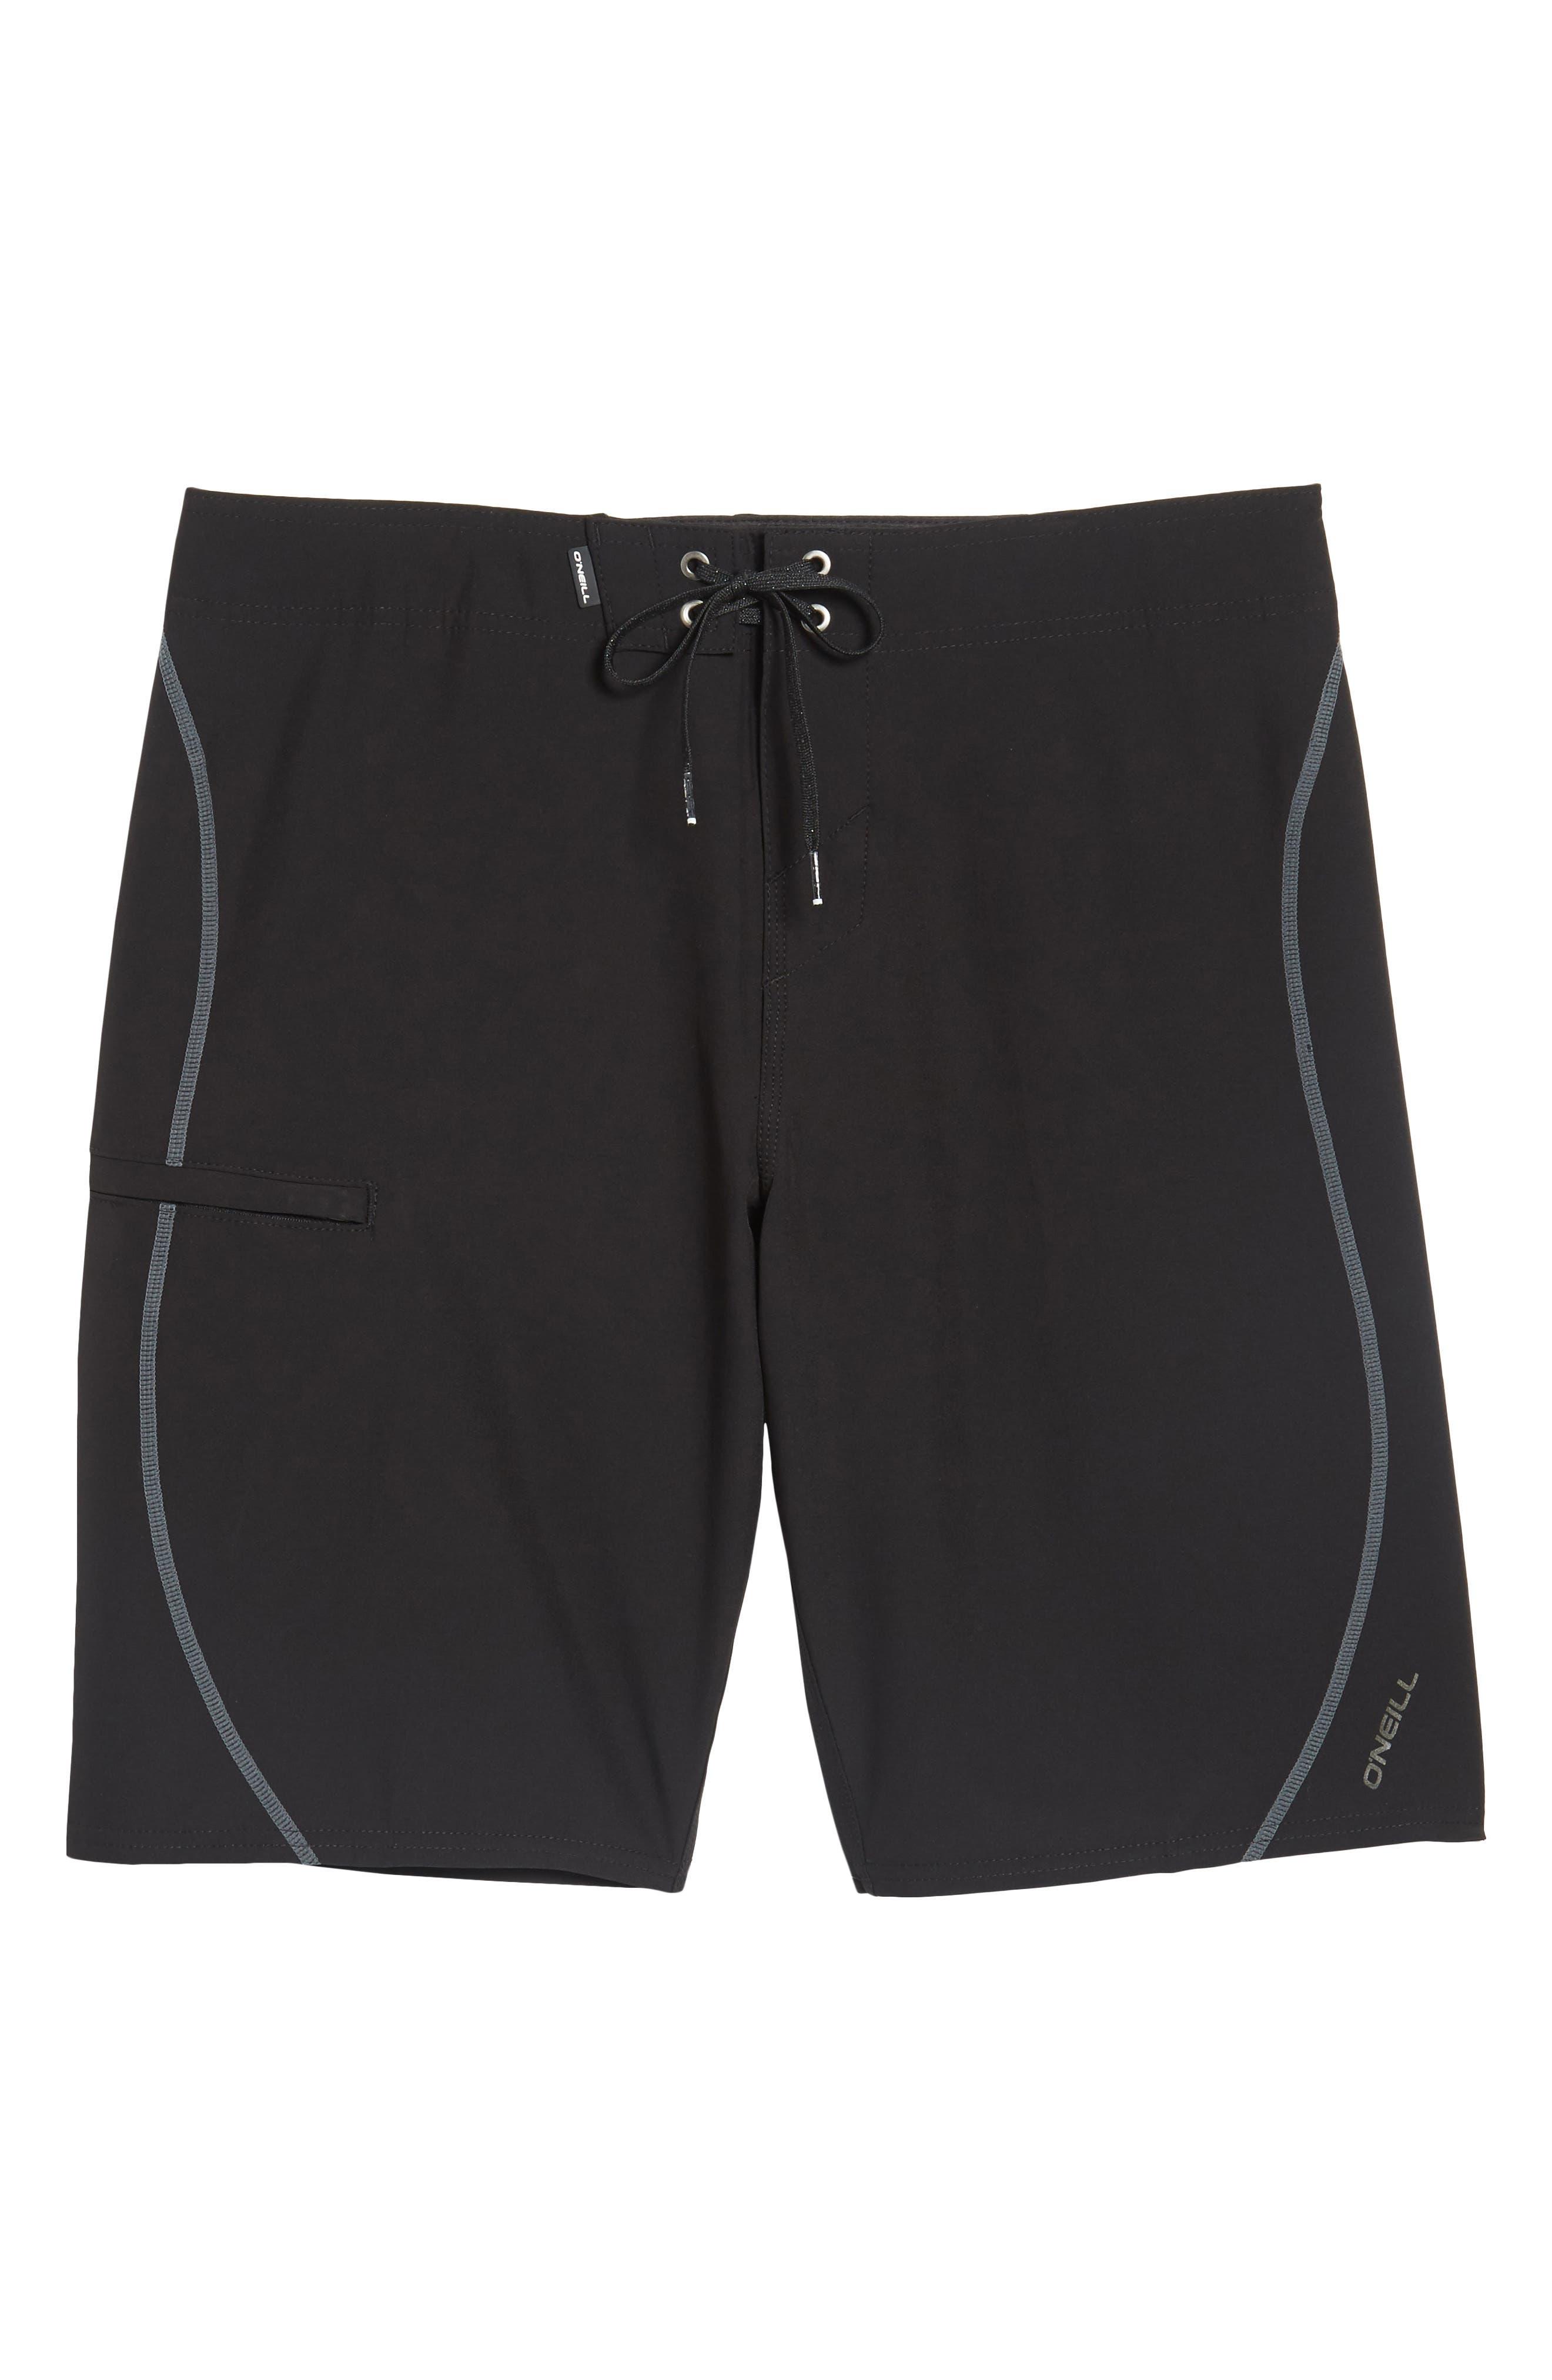 Hyperfreak S-Seam Board Shorts,                             Alternate thumbnail 6, color,                             001